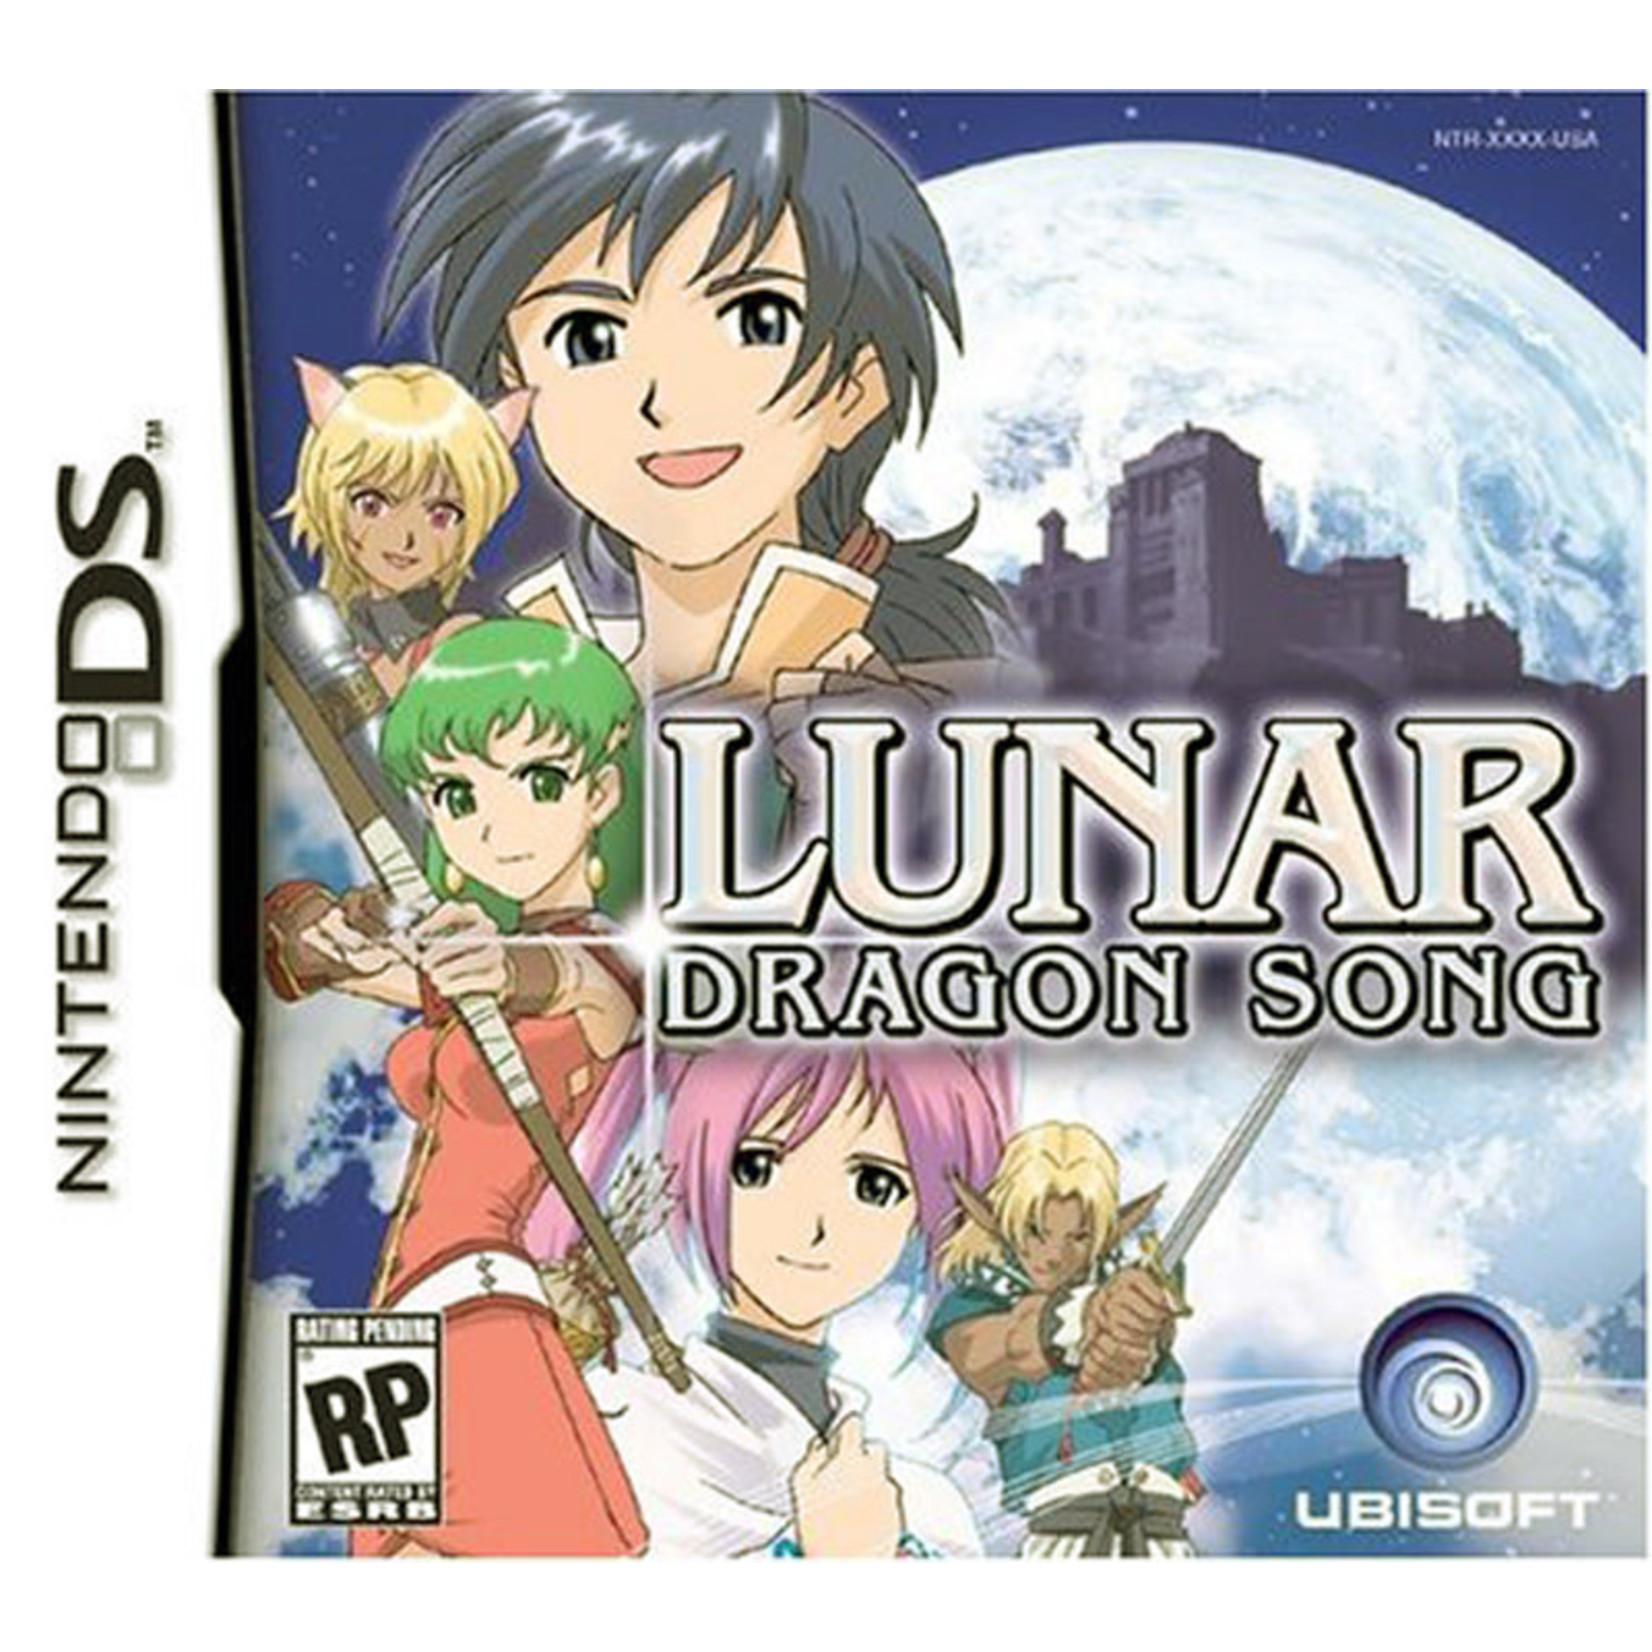 DSu-Lunar Dragon Song (chip only)